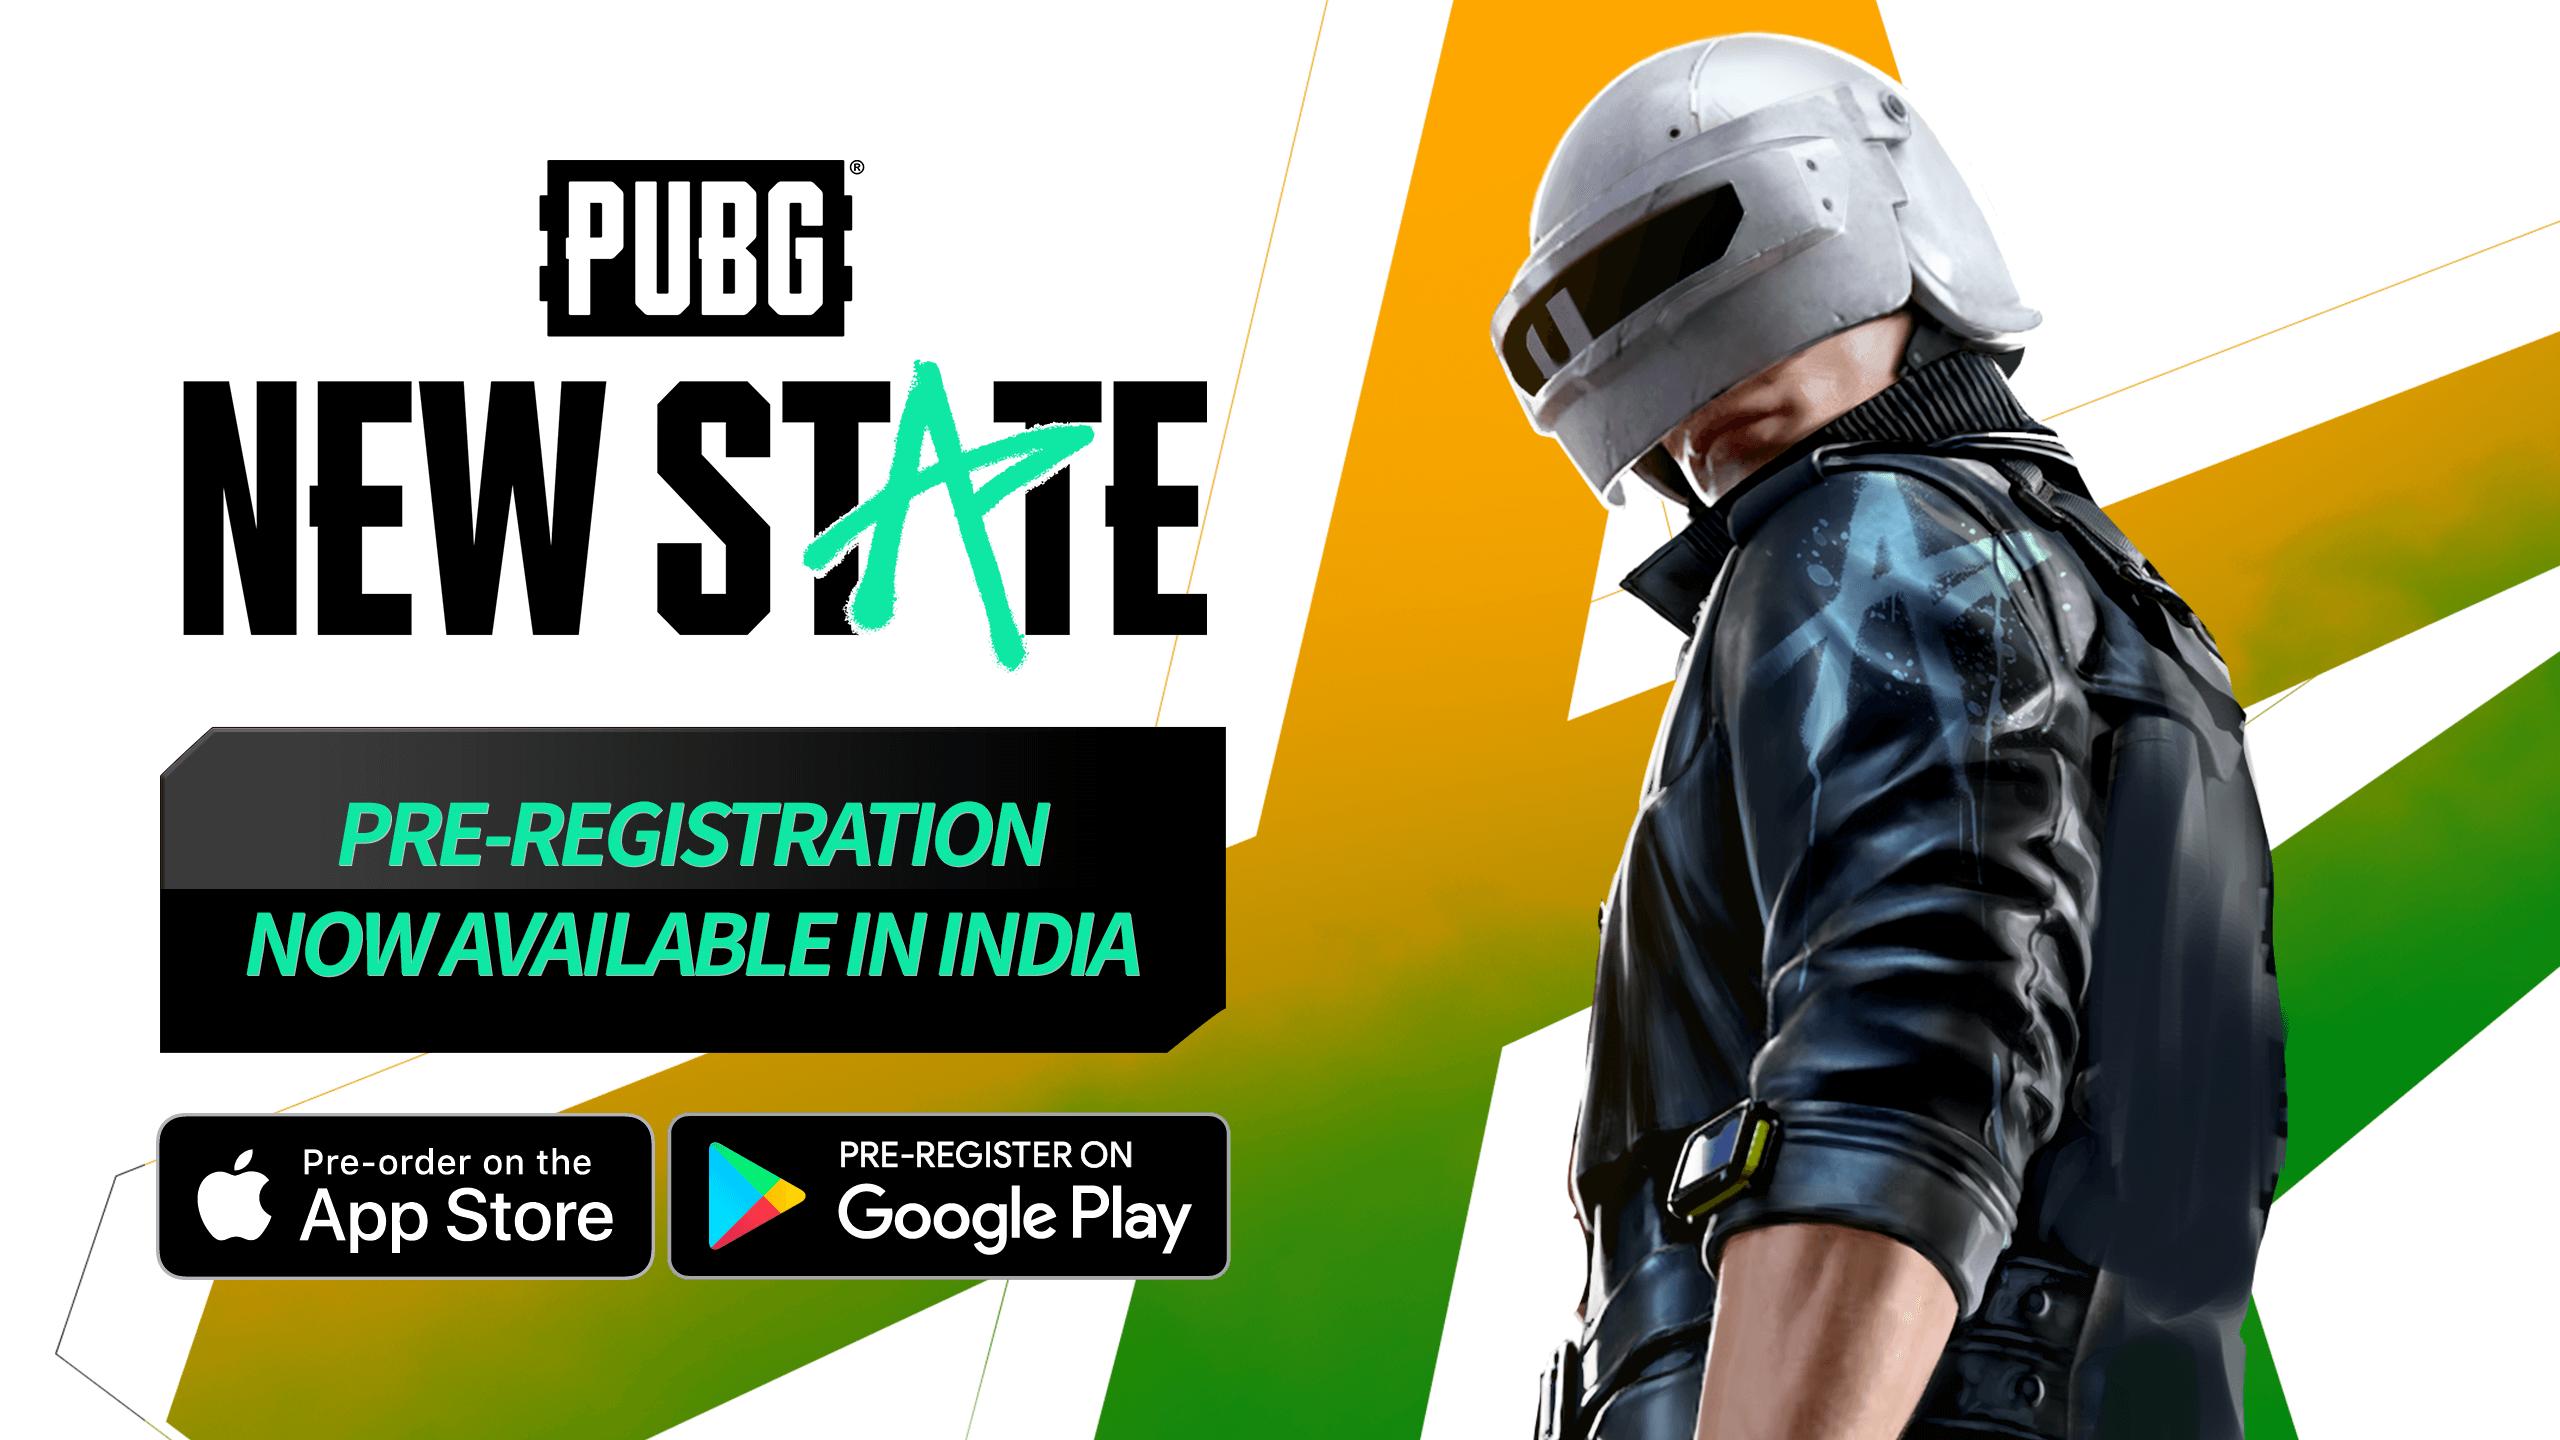 PUBG New State 2192021